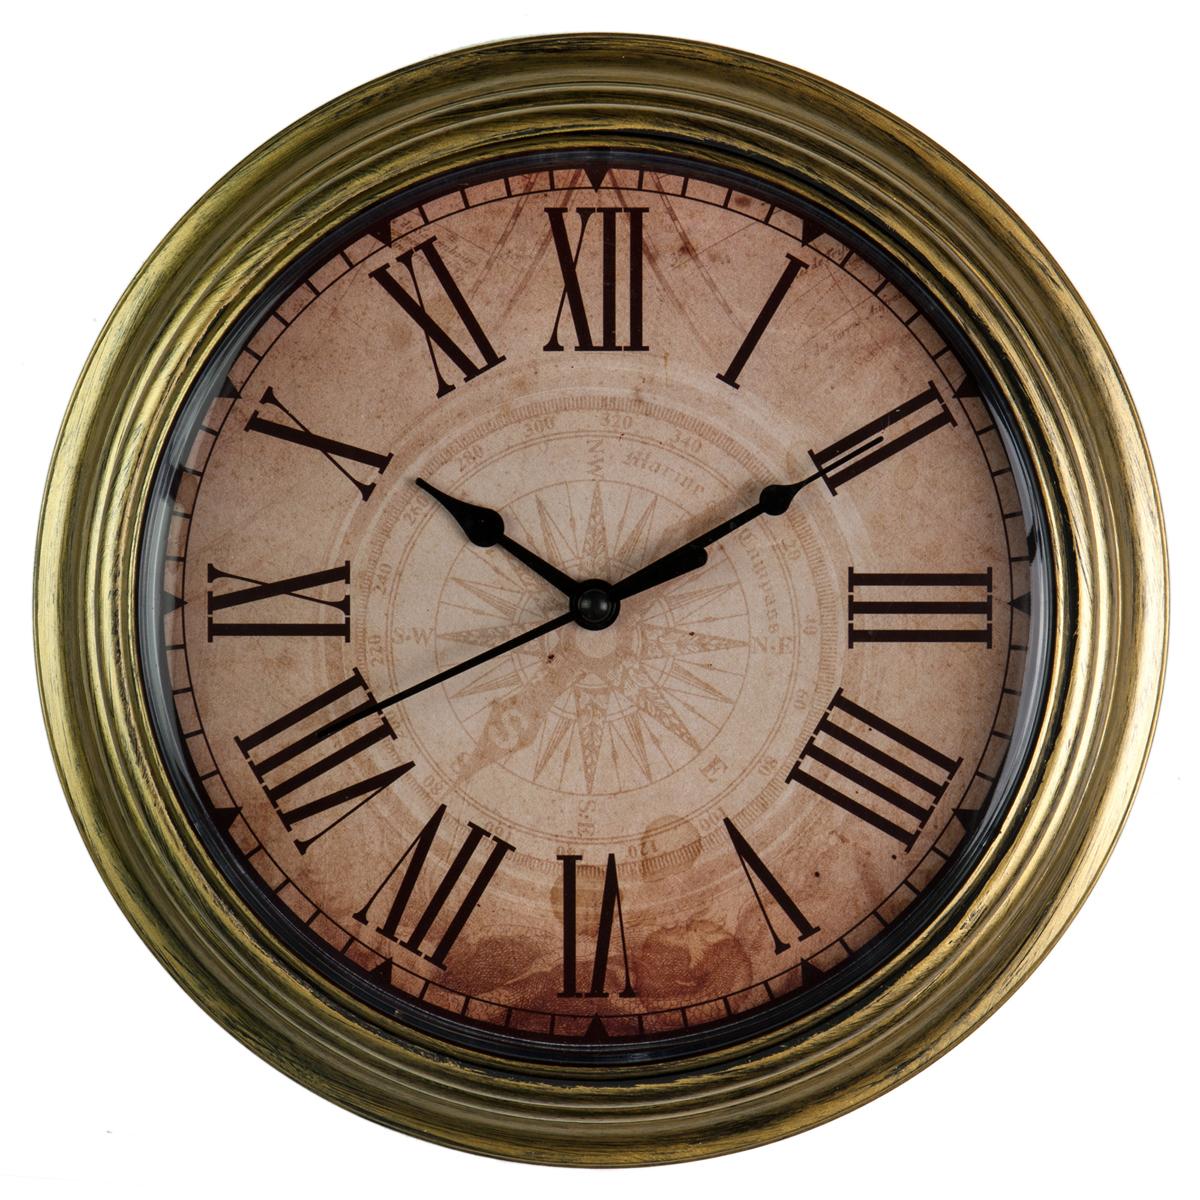 Часы настенные Miralight, 23 x 23 см. MC-4722 meinl mc pts 12 x 12